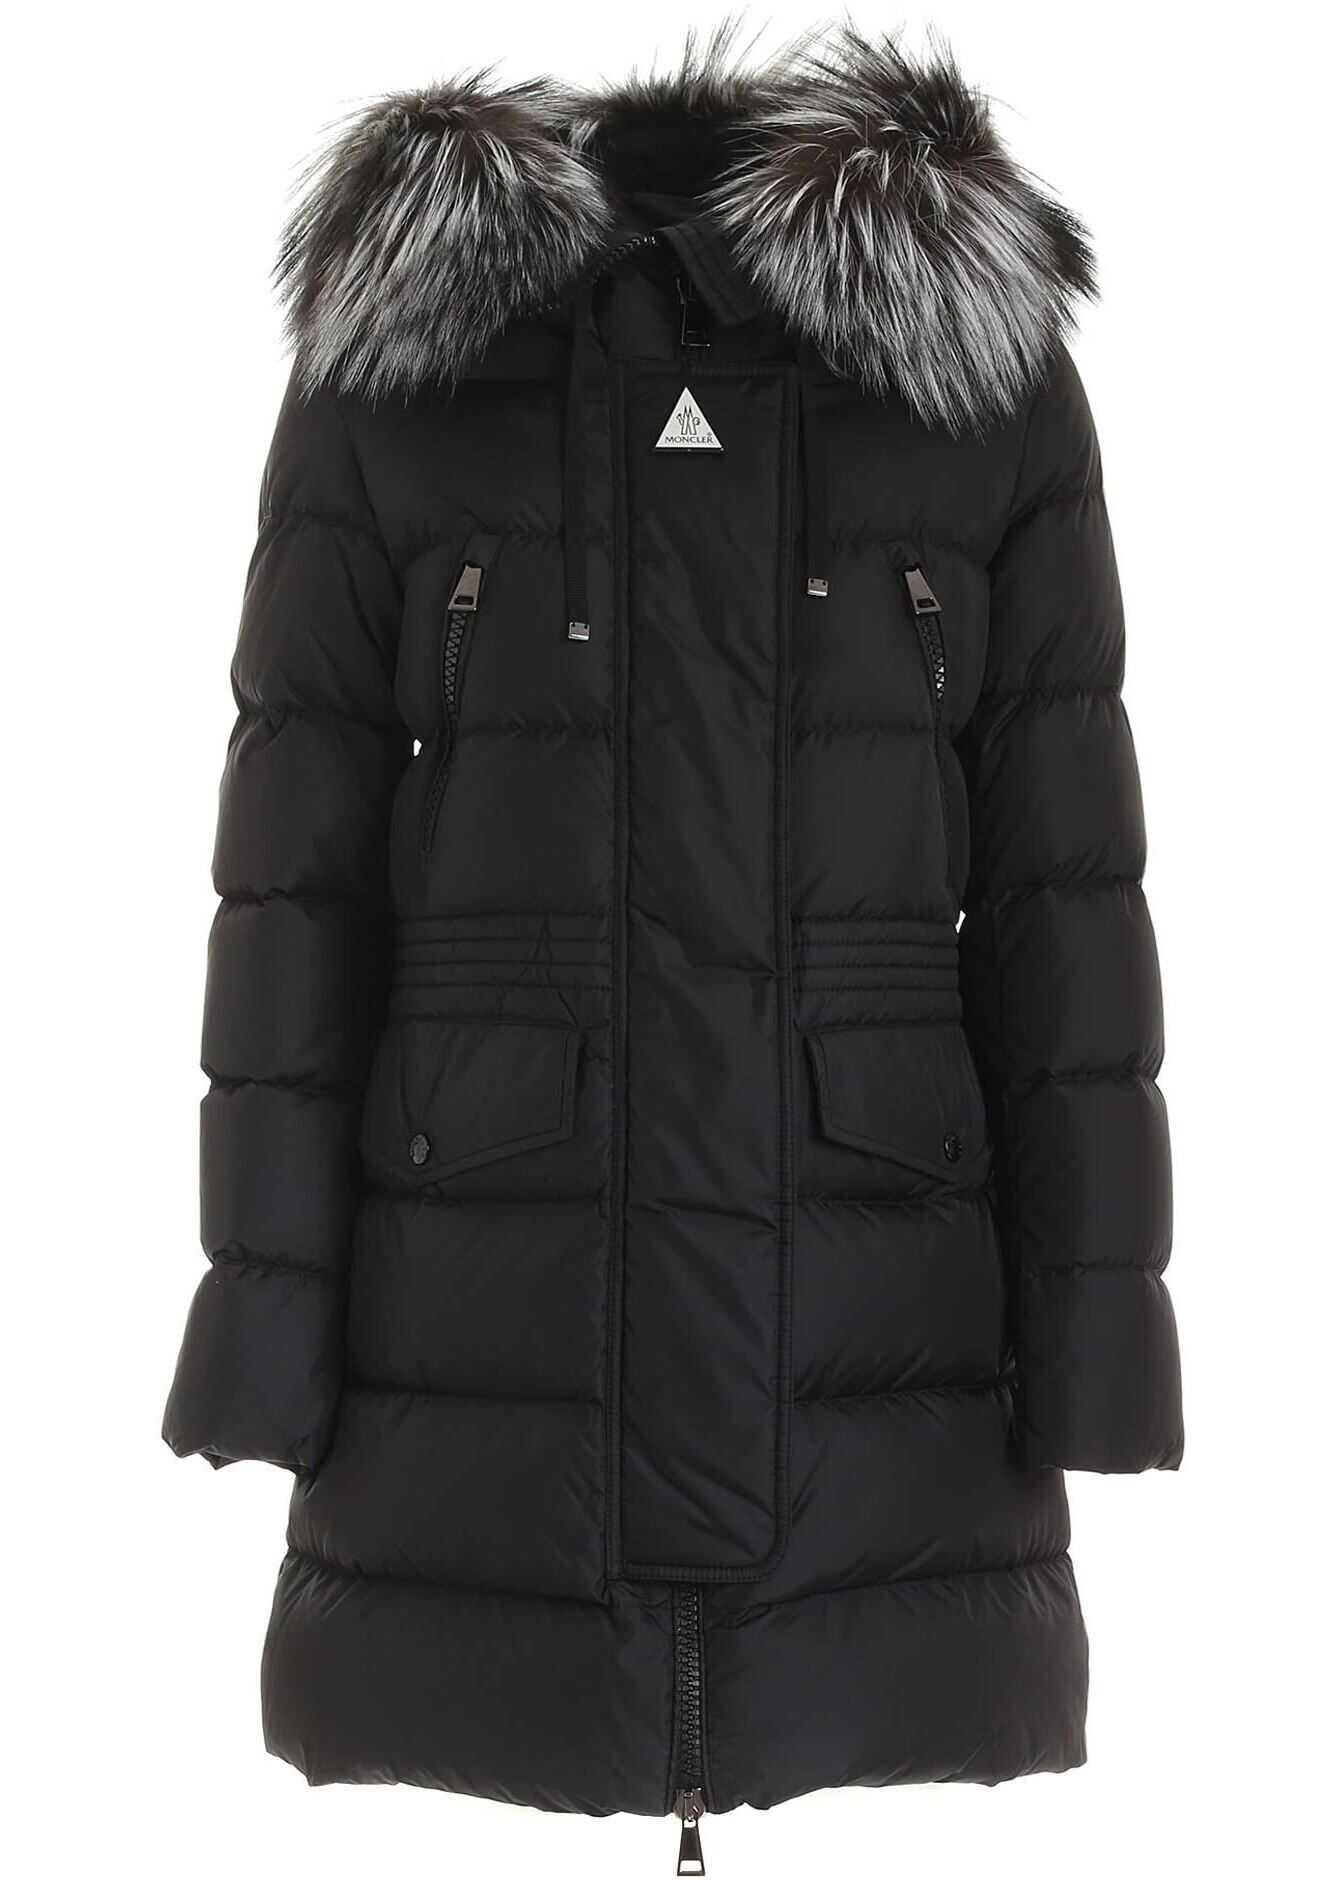 Moncler Aphroti Long Down Jacket In Black Featuring Hood Black